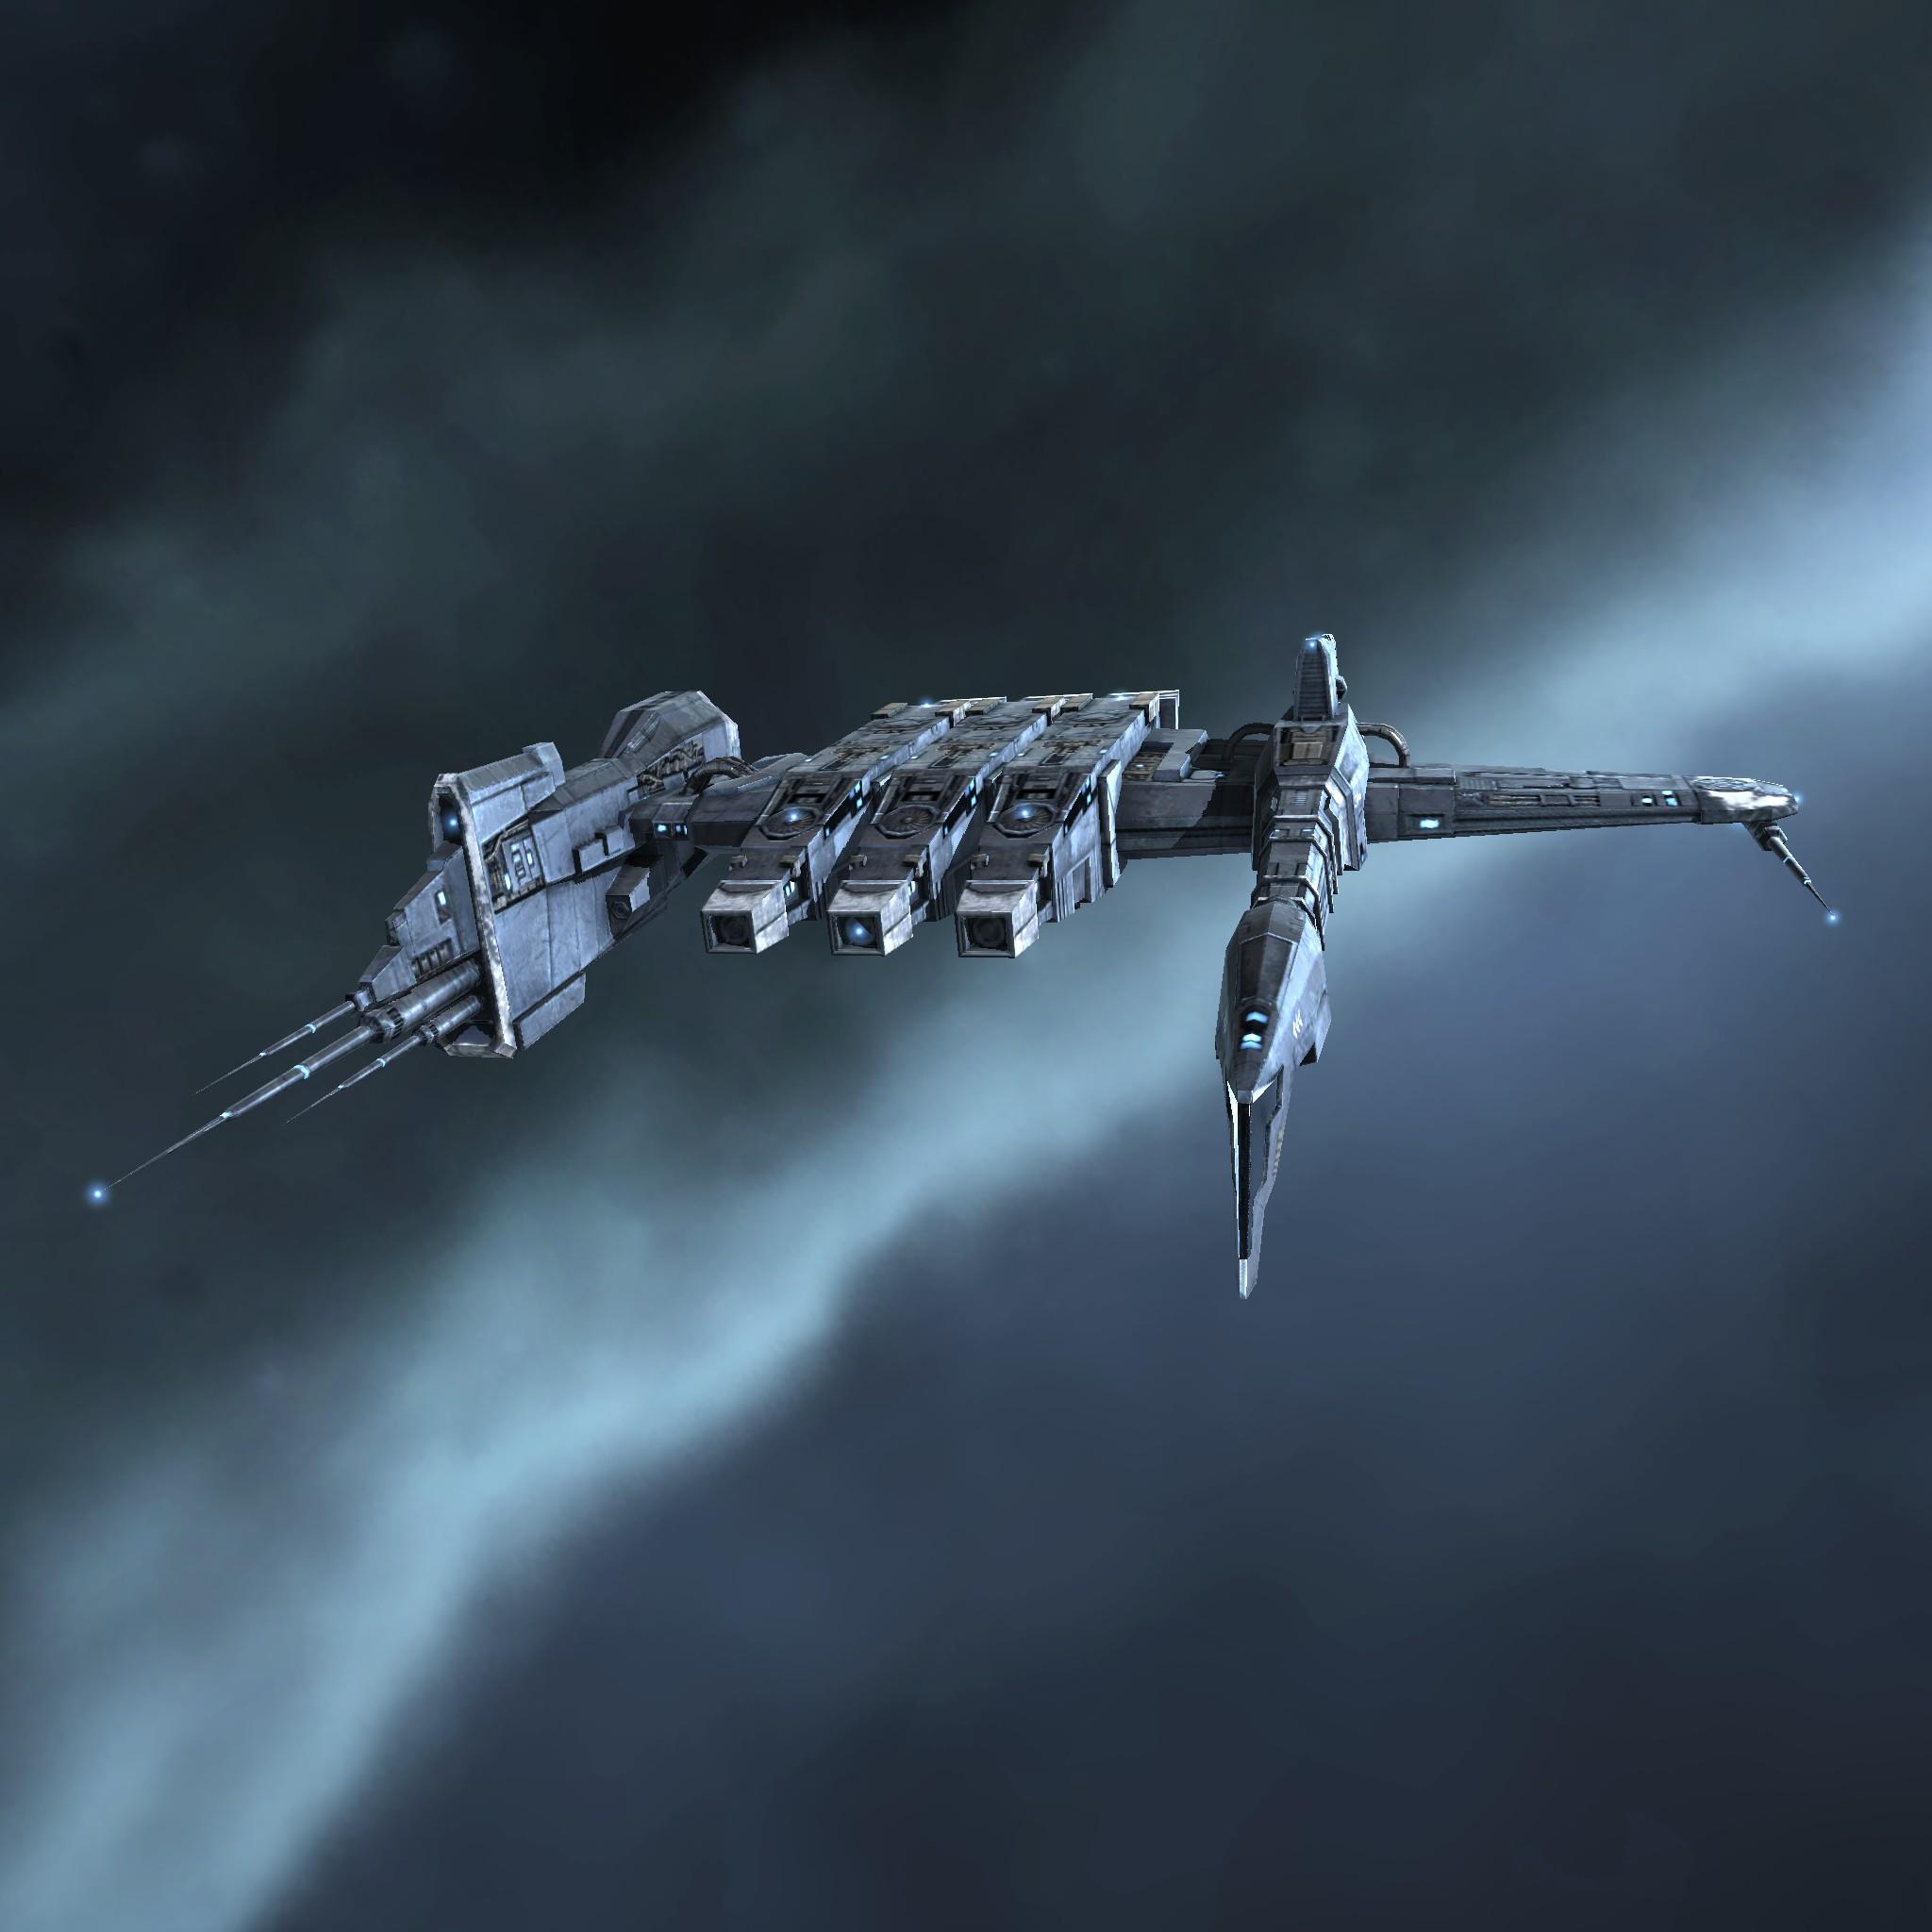 Eve ship kestrel kestrel malvernweather Images